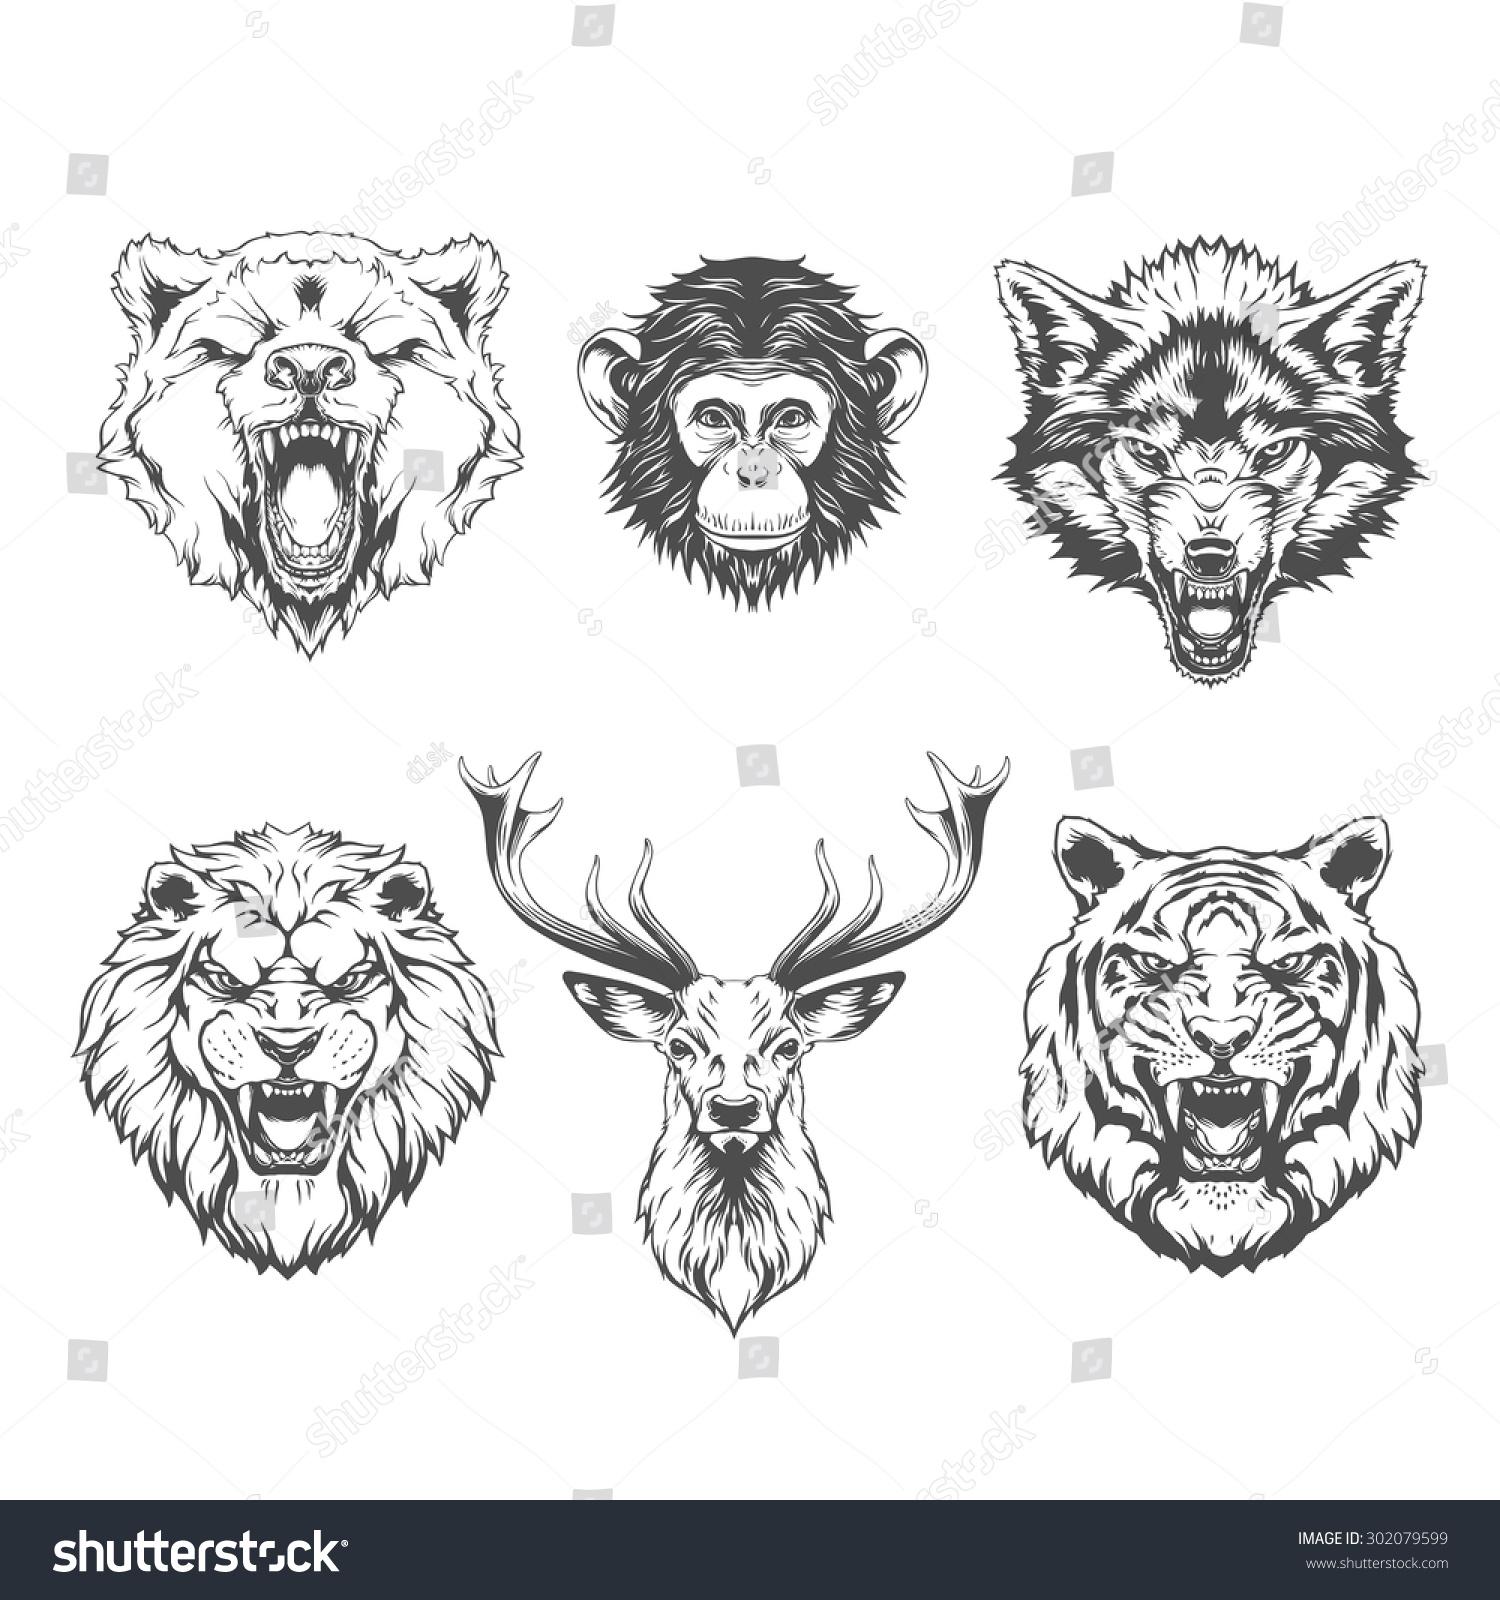 Vector Line Art Animals : Animals heads line art stock vector shutterstock